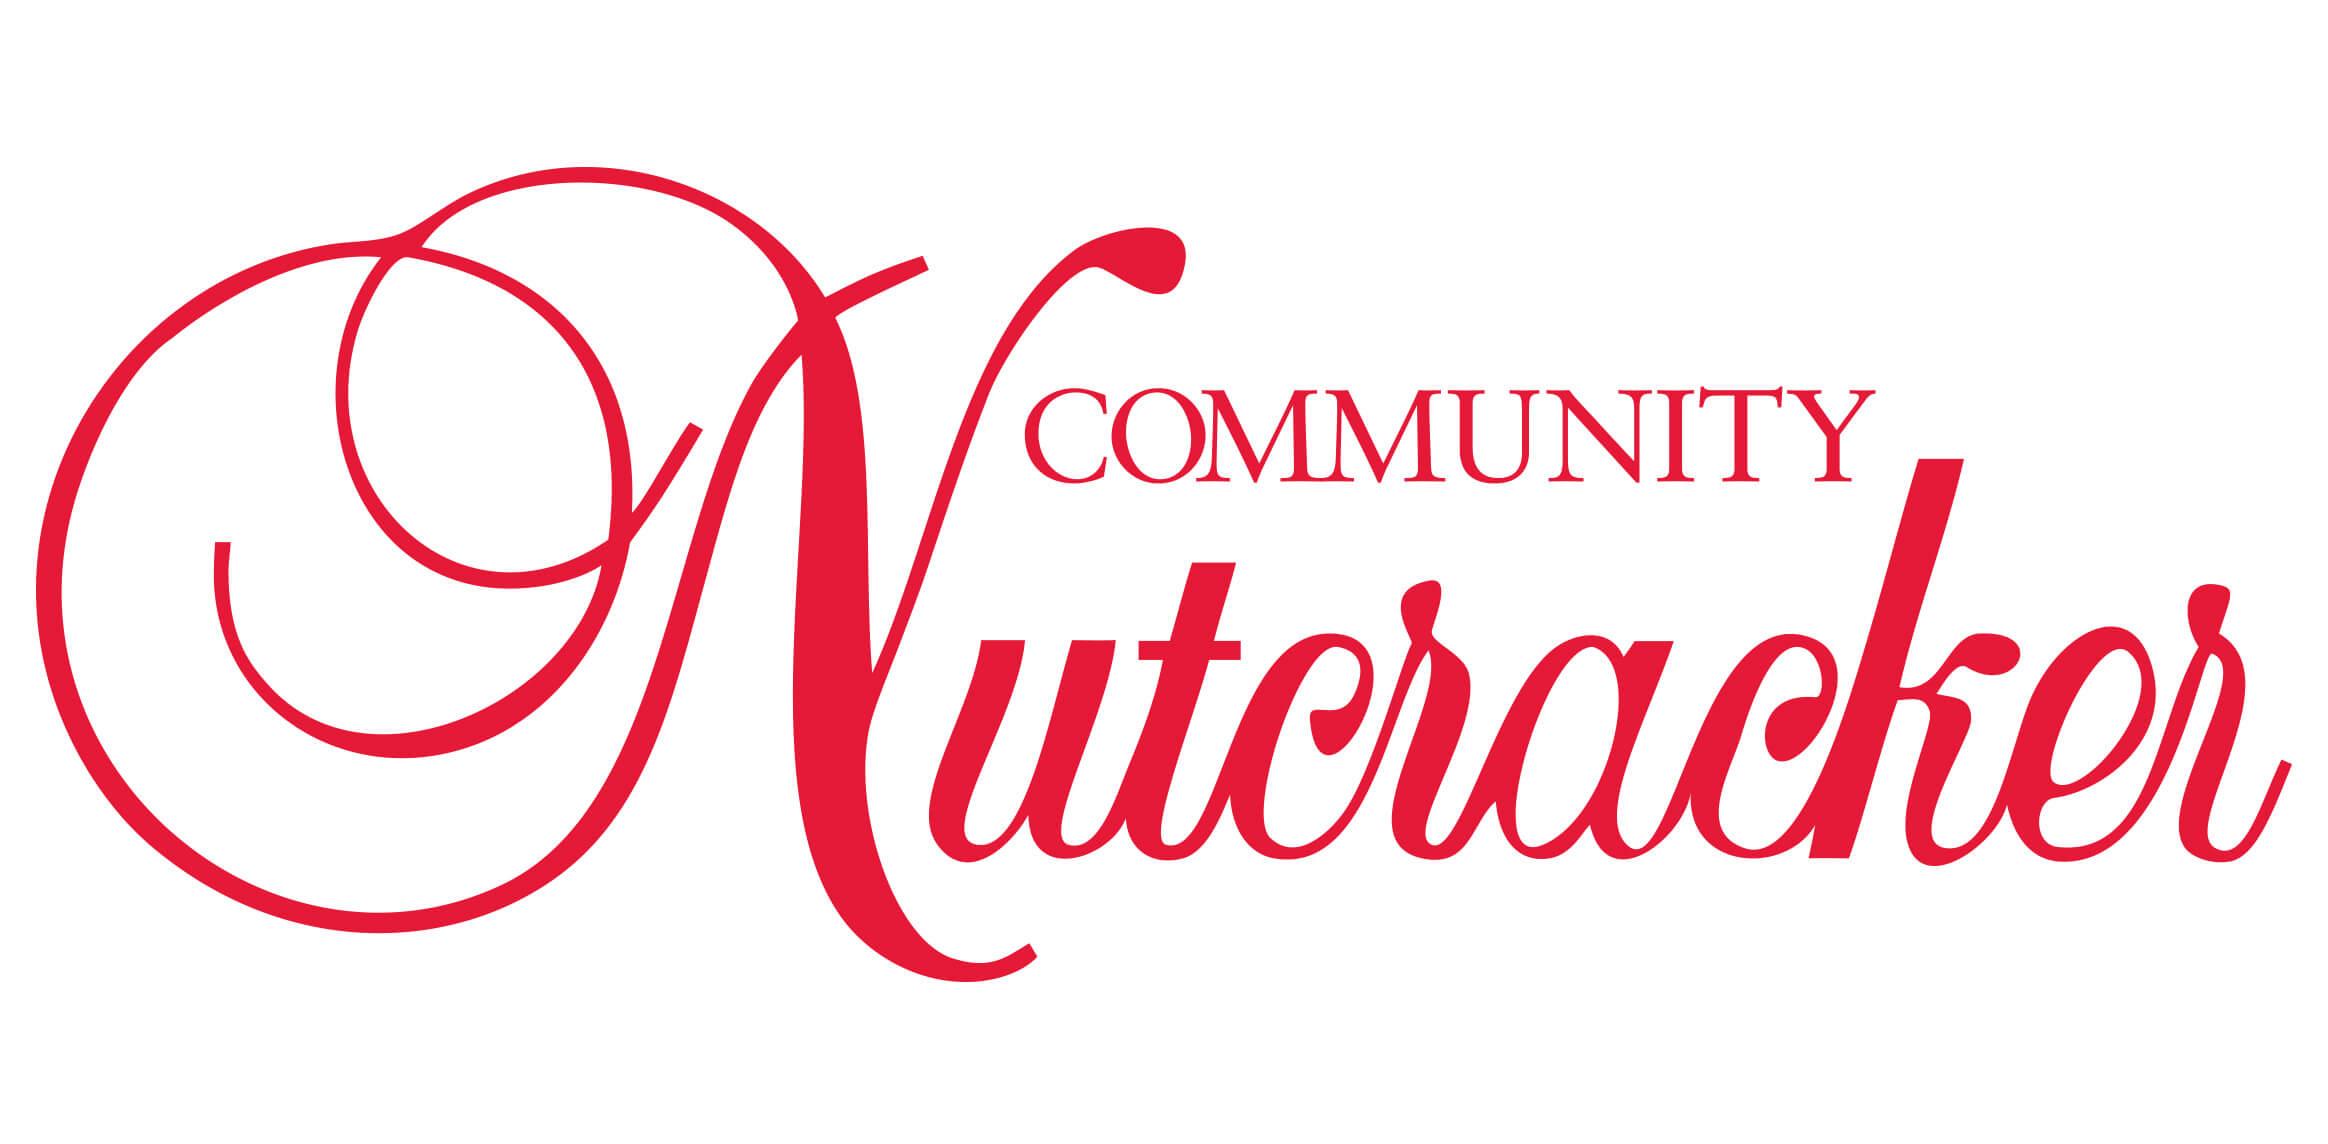 Community Nutcracker - HEAL Sponsor